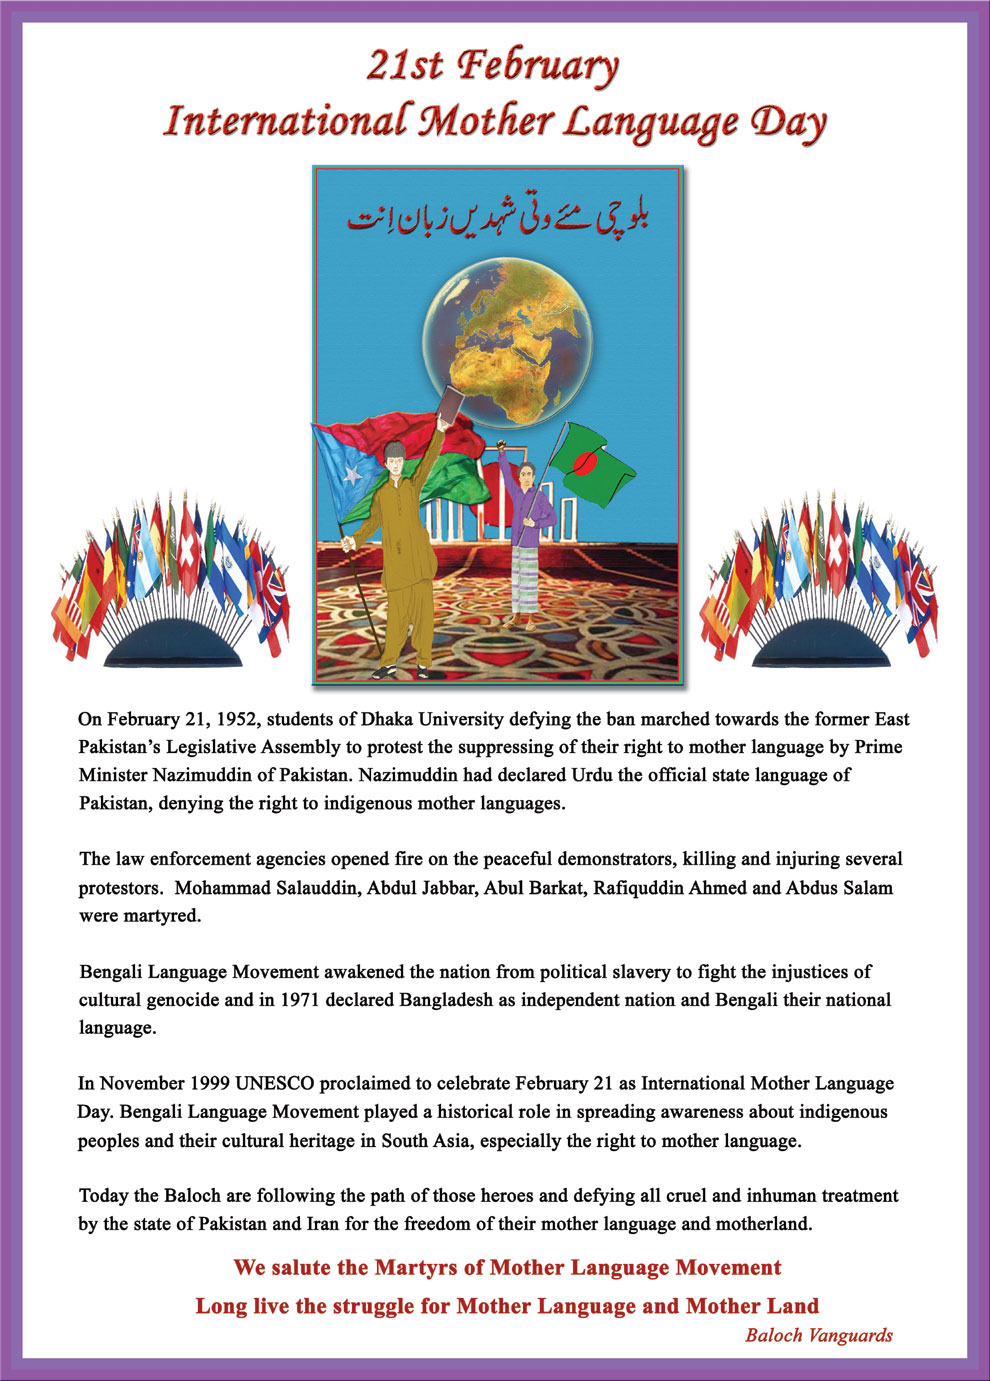 21 International Fashion Magazine You Ll Love: Feb 21: International Mother Language Day